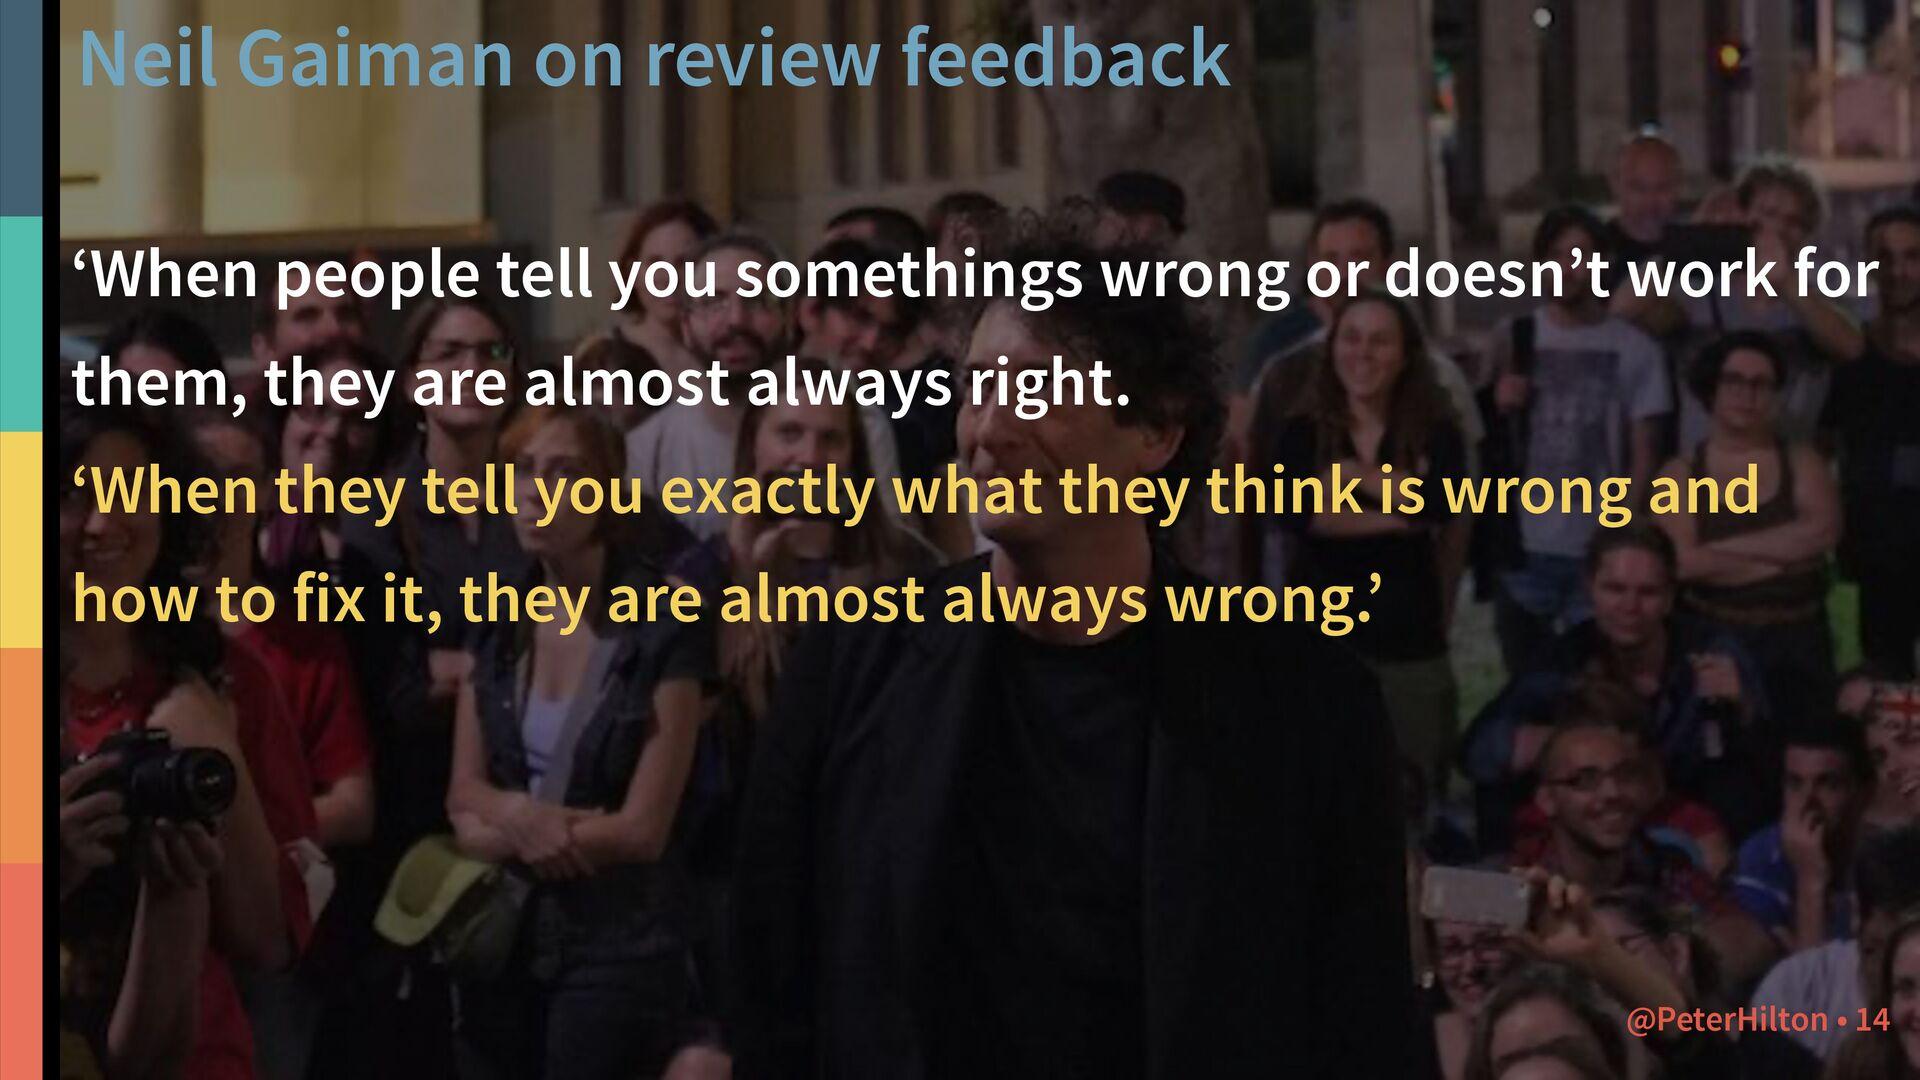 Neil Gaiman on open source 'The main rule of wr...